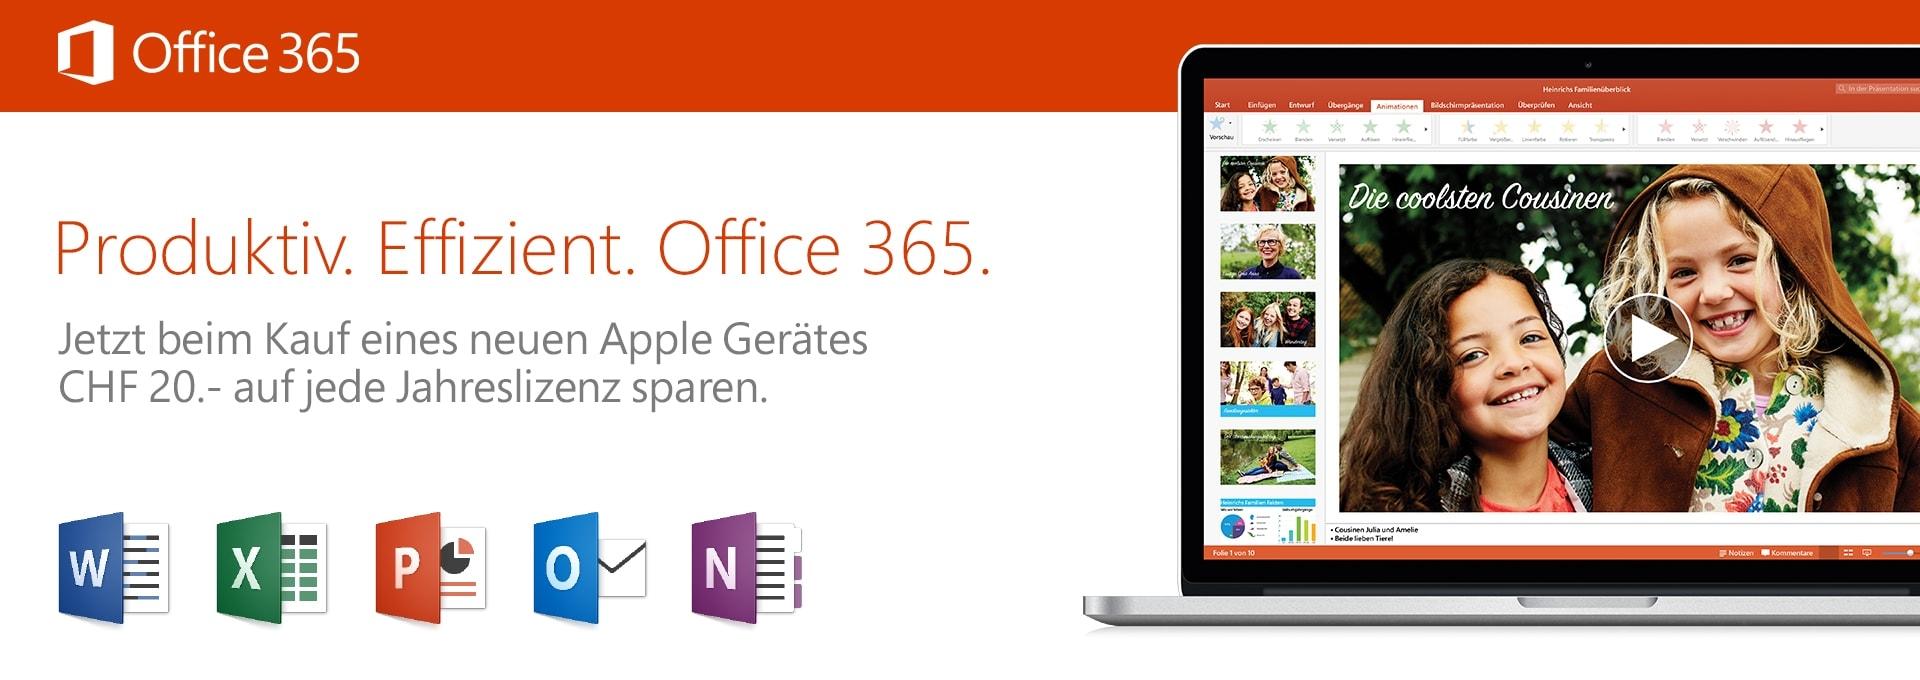 Microsoft Office 2016 - CHF 20 Attach Promo